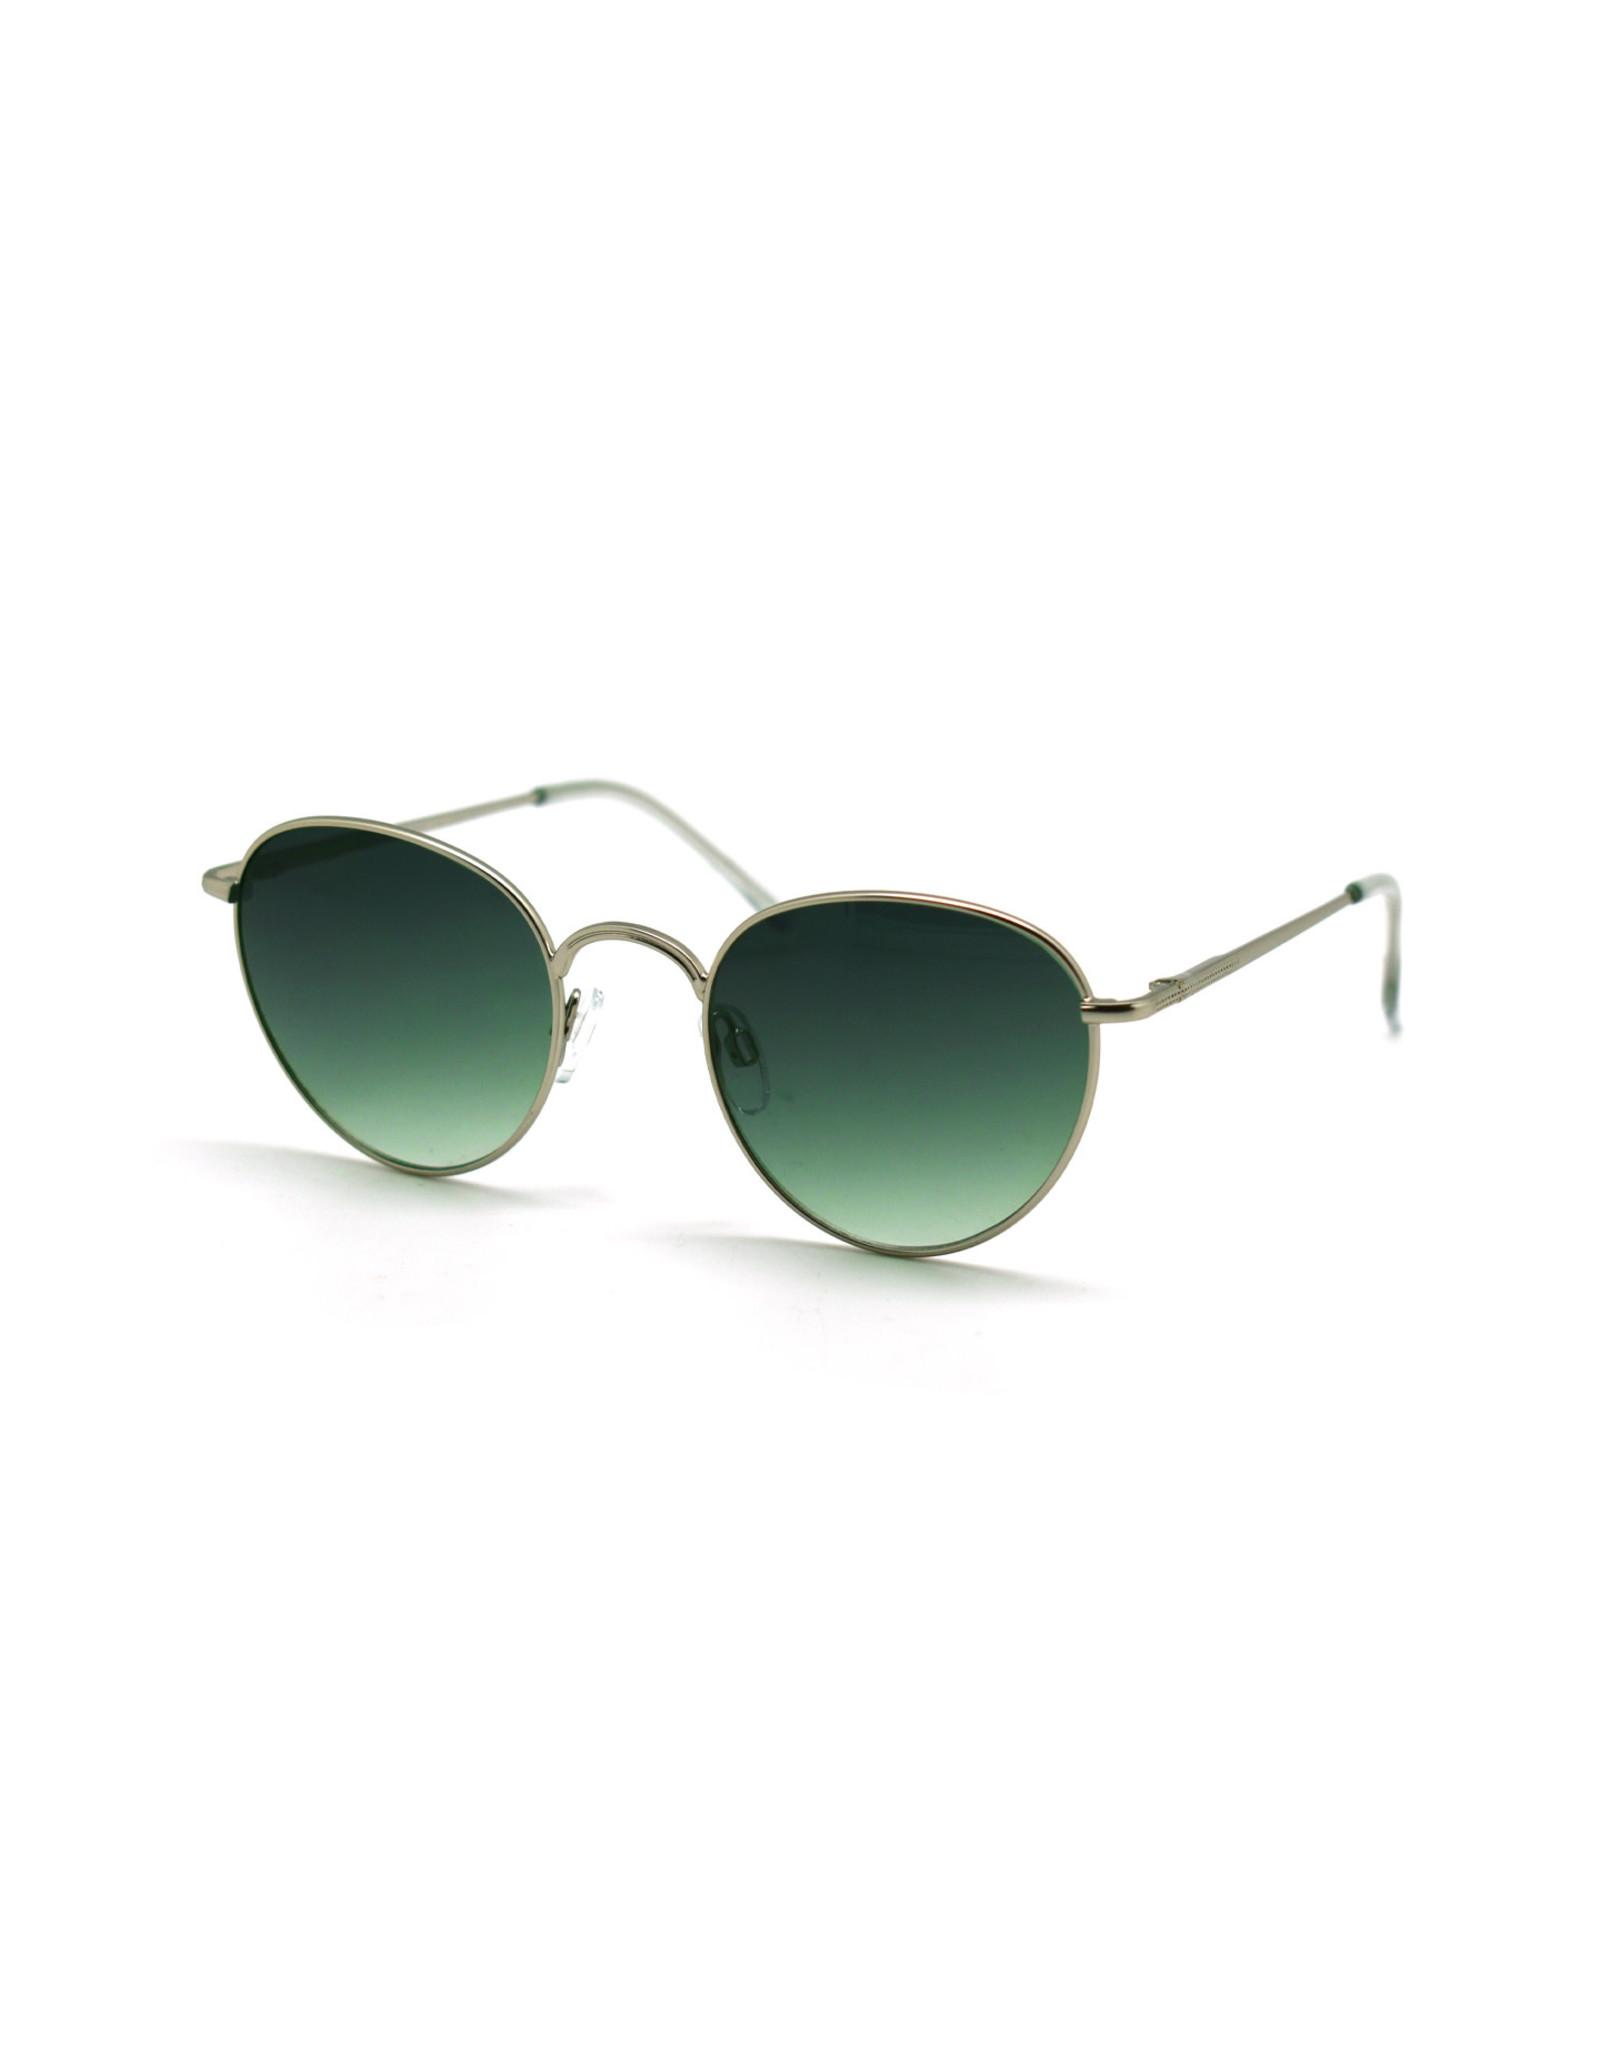 Slytherin Sunglasses